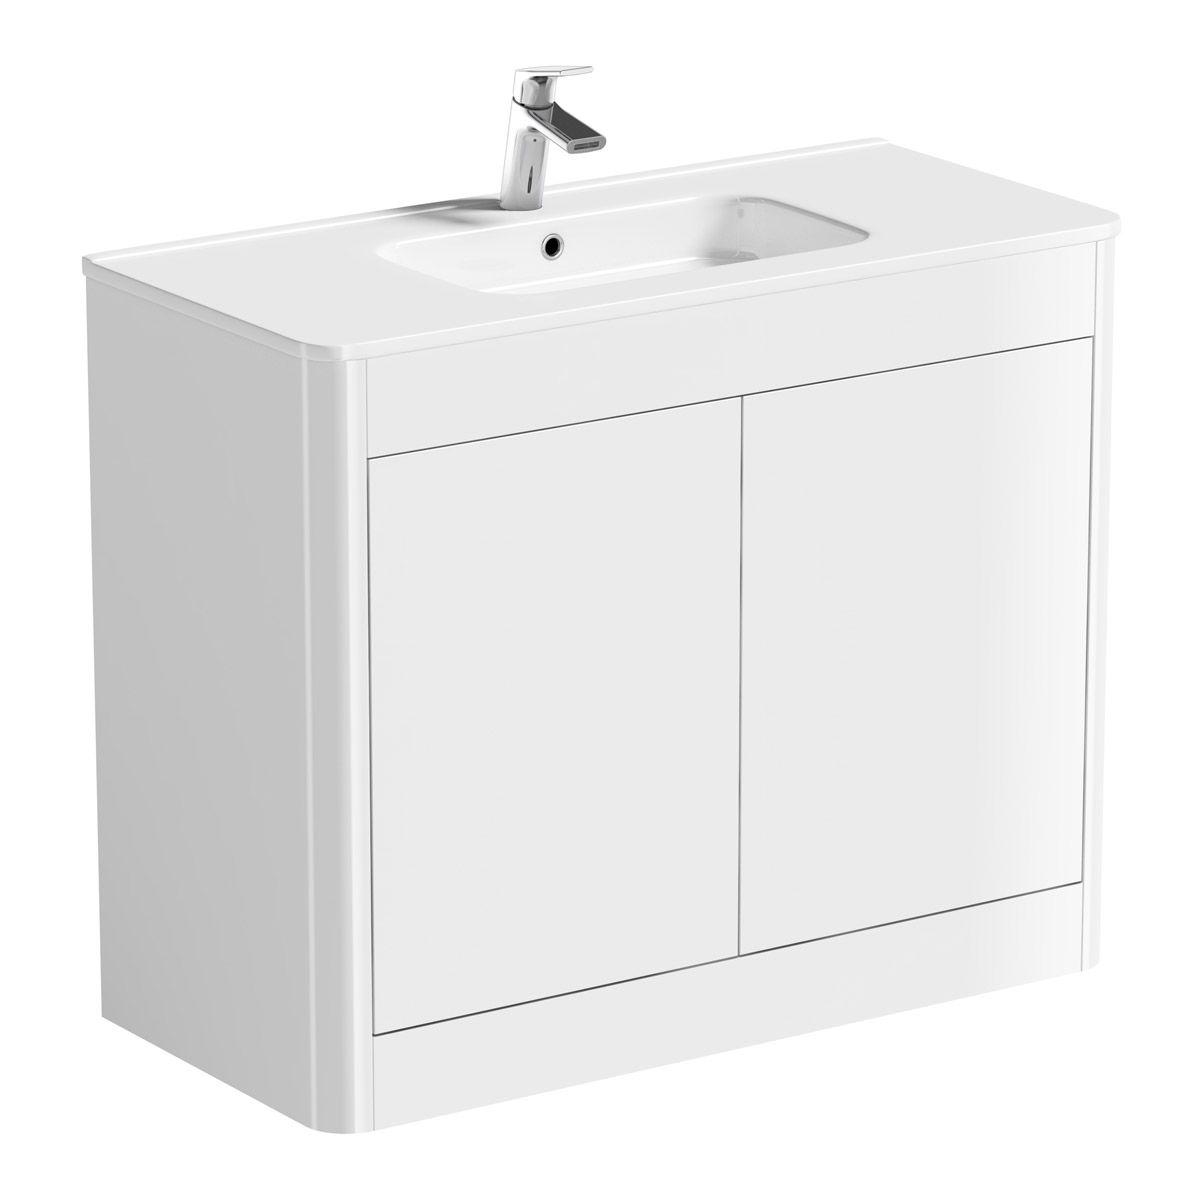 Mode Carter White Floorstanding Vanity Unit And Ceramic Basin 1000mm Basin Vanity Unit Vanity Units Bathroom Vanity Units